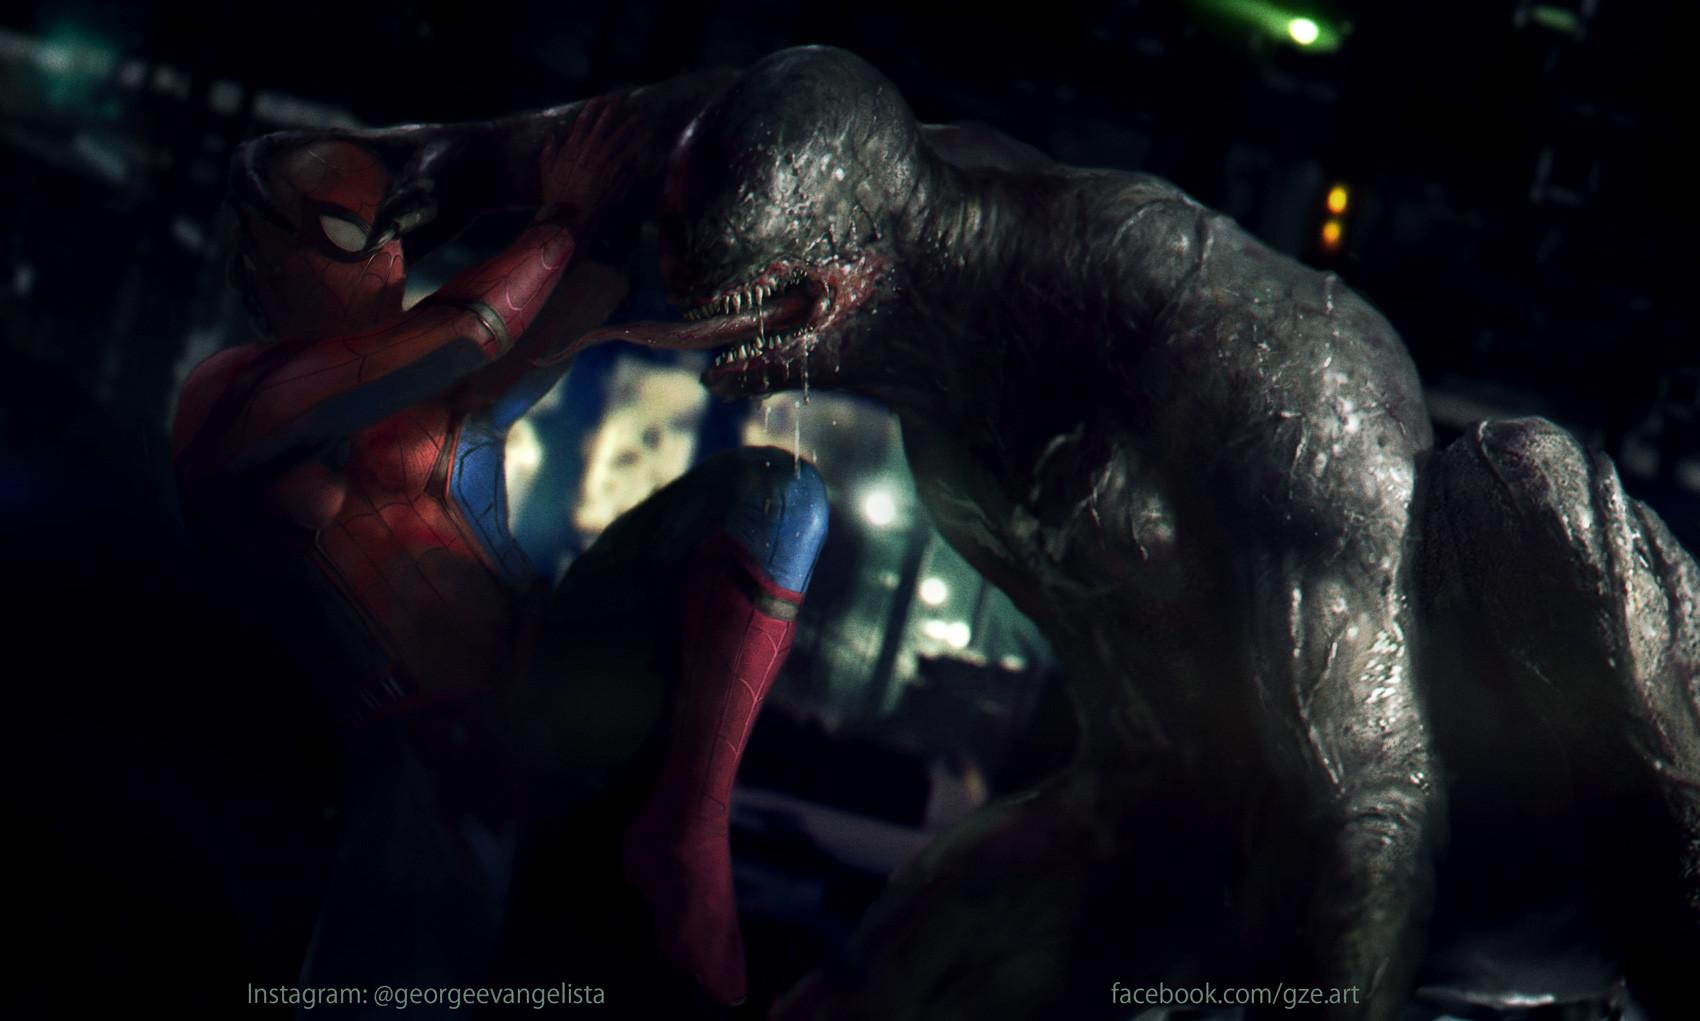 Justice League Movie Hd Wallpapers Artstation Venom Vs Spiderman George Evangelista